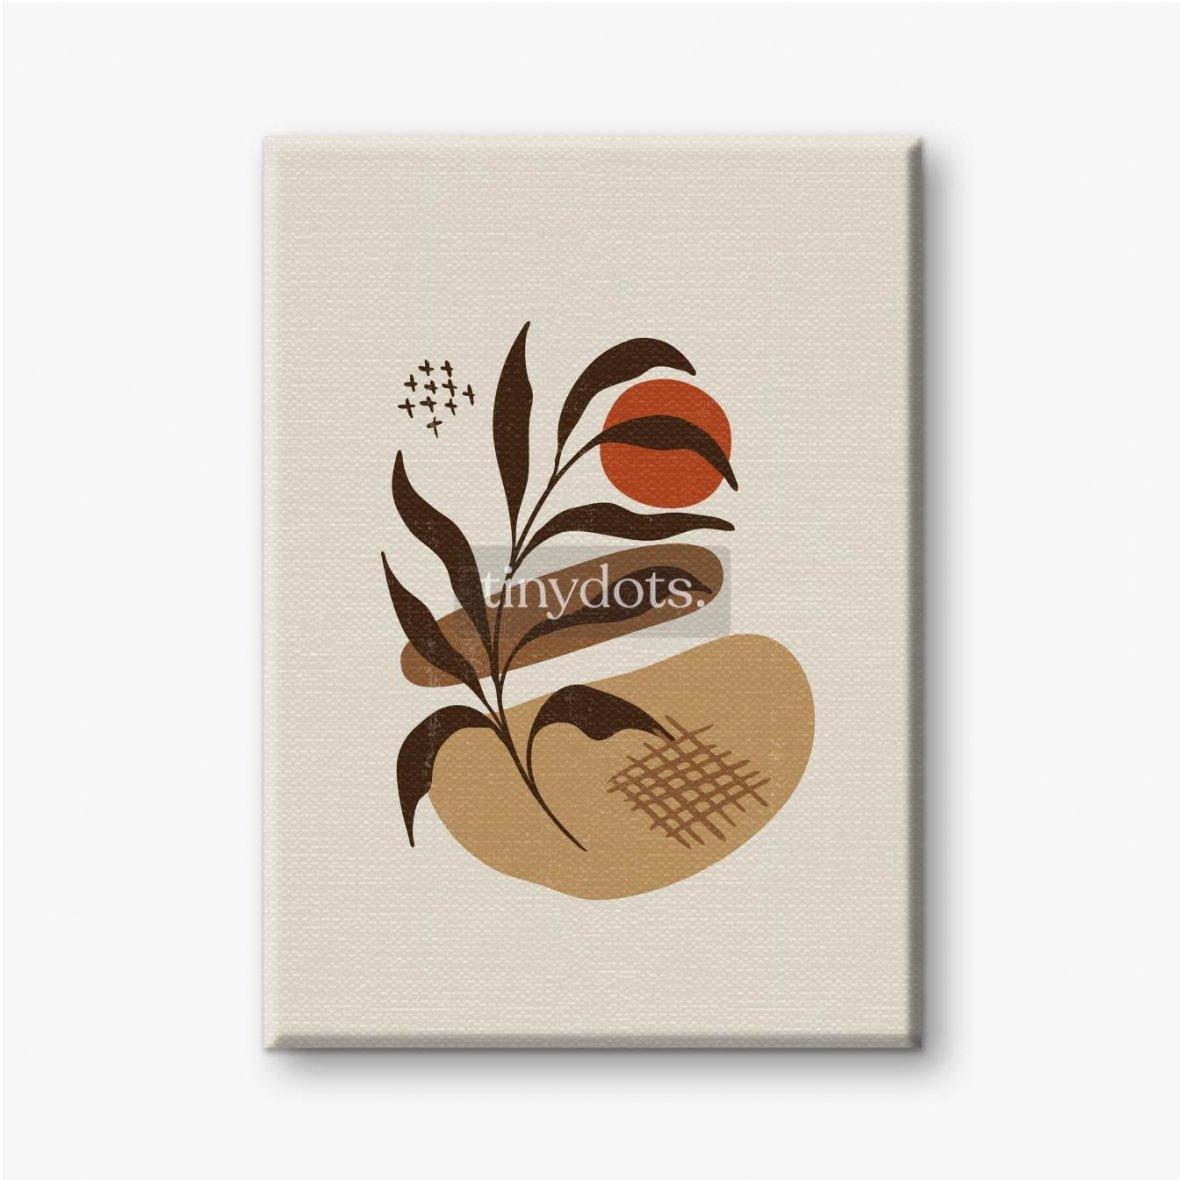 Leinwandbild Boho minimalistische Kunst mit Pflanze